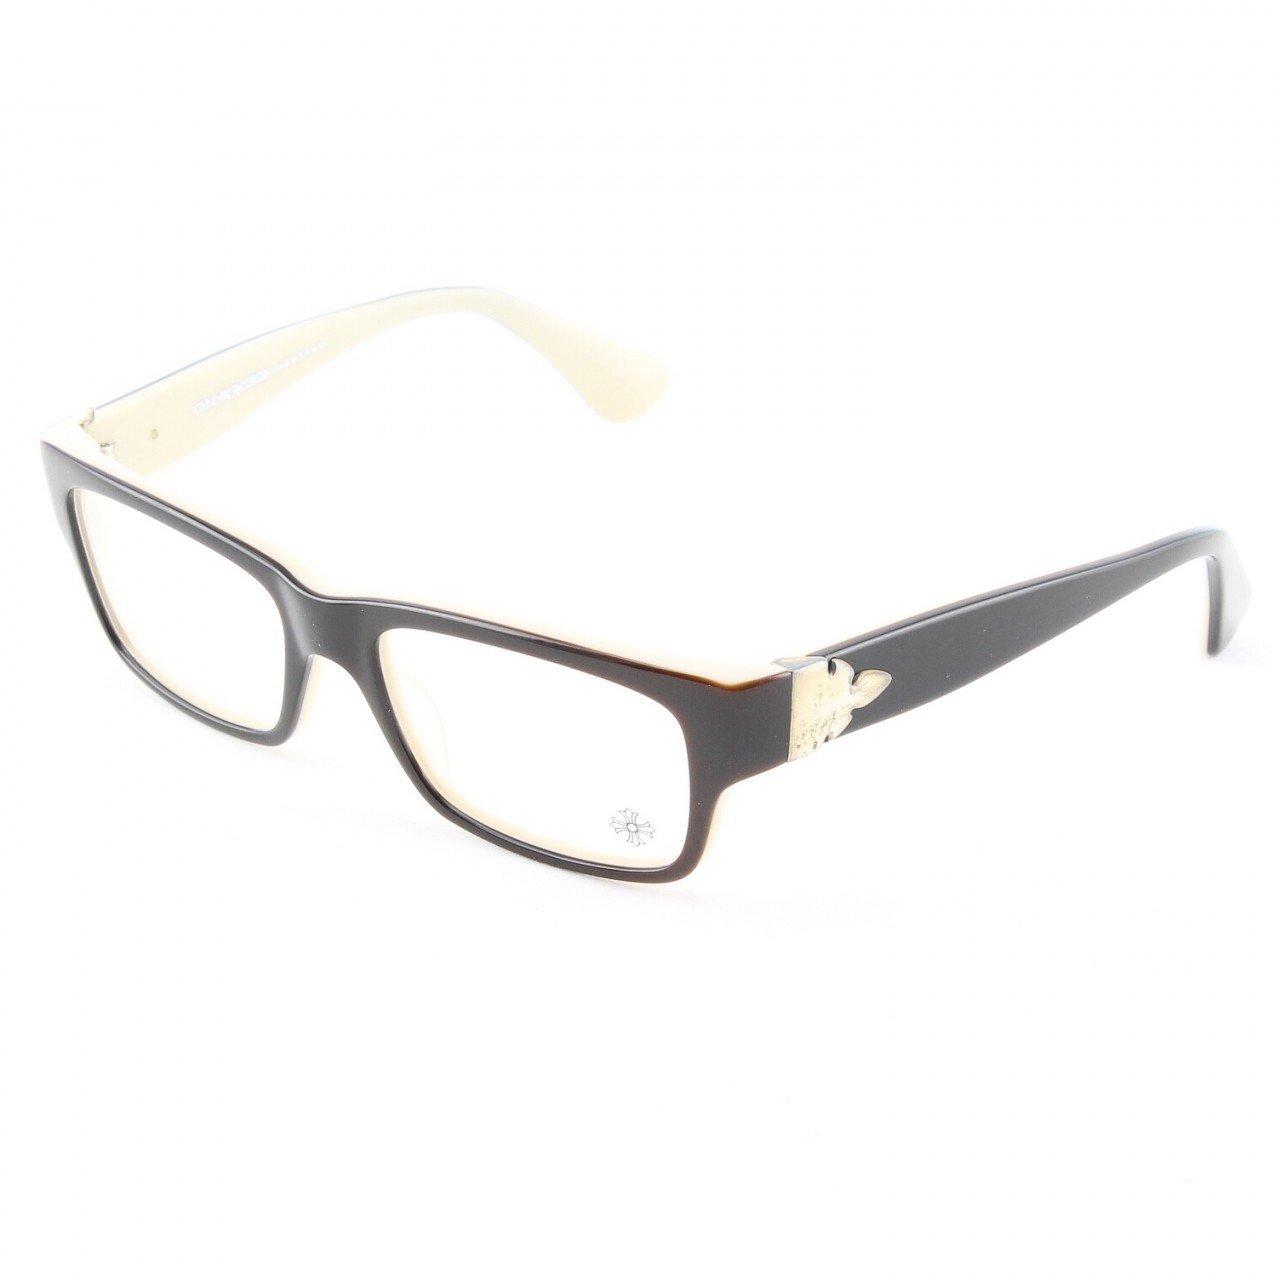 Chrome Hearts The Works Flerknee Eyeglasses Black and Tan